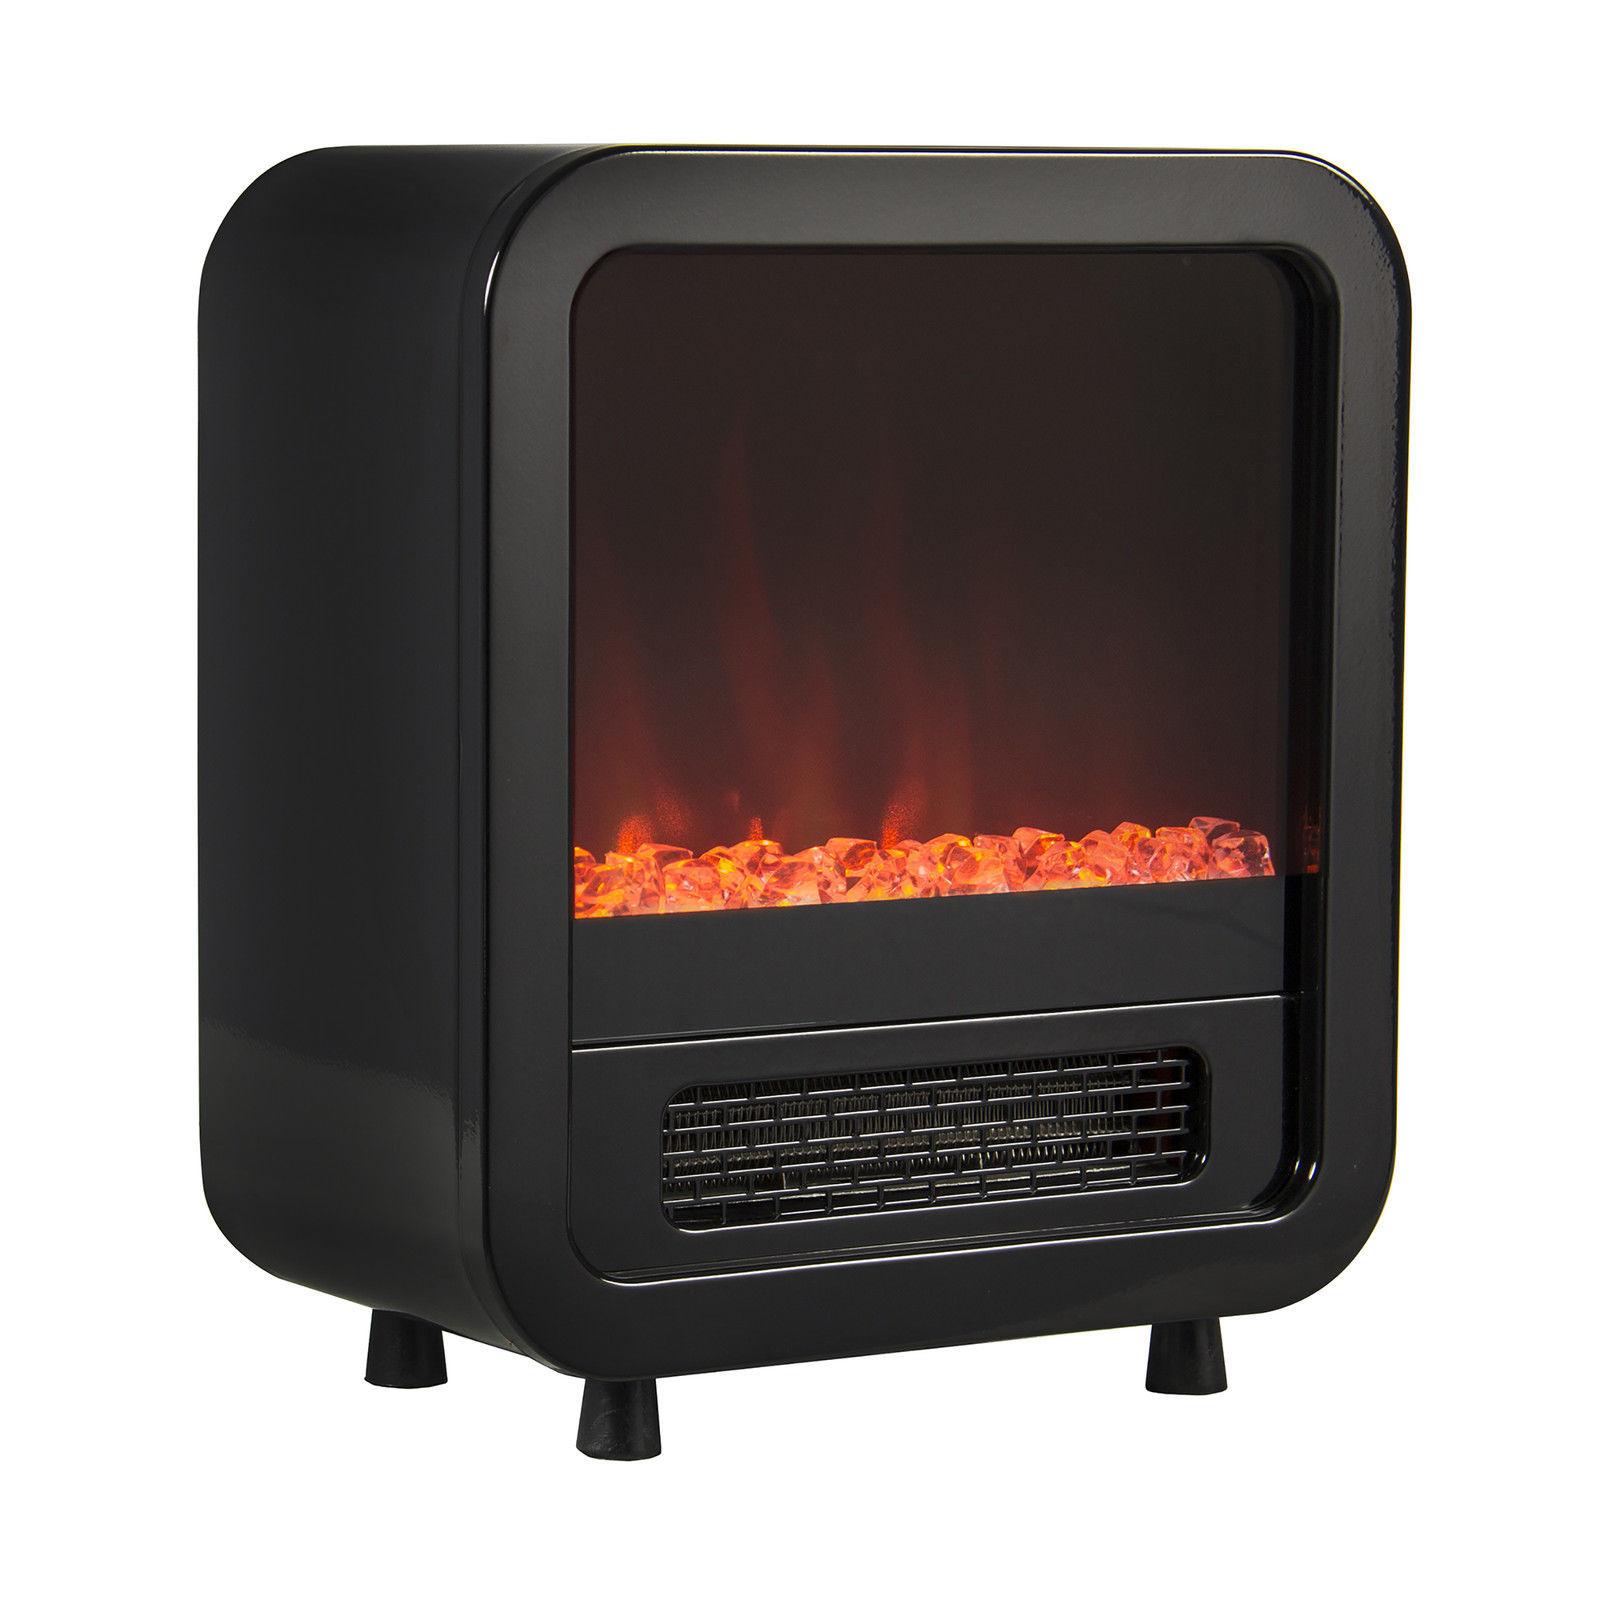 Electric Adjustable Fireplace Portable Mini And 50 Similar